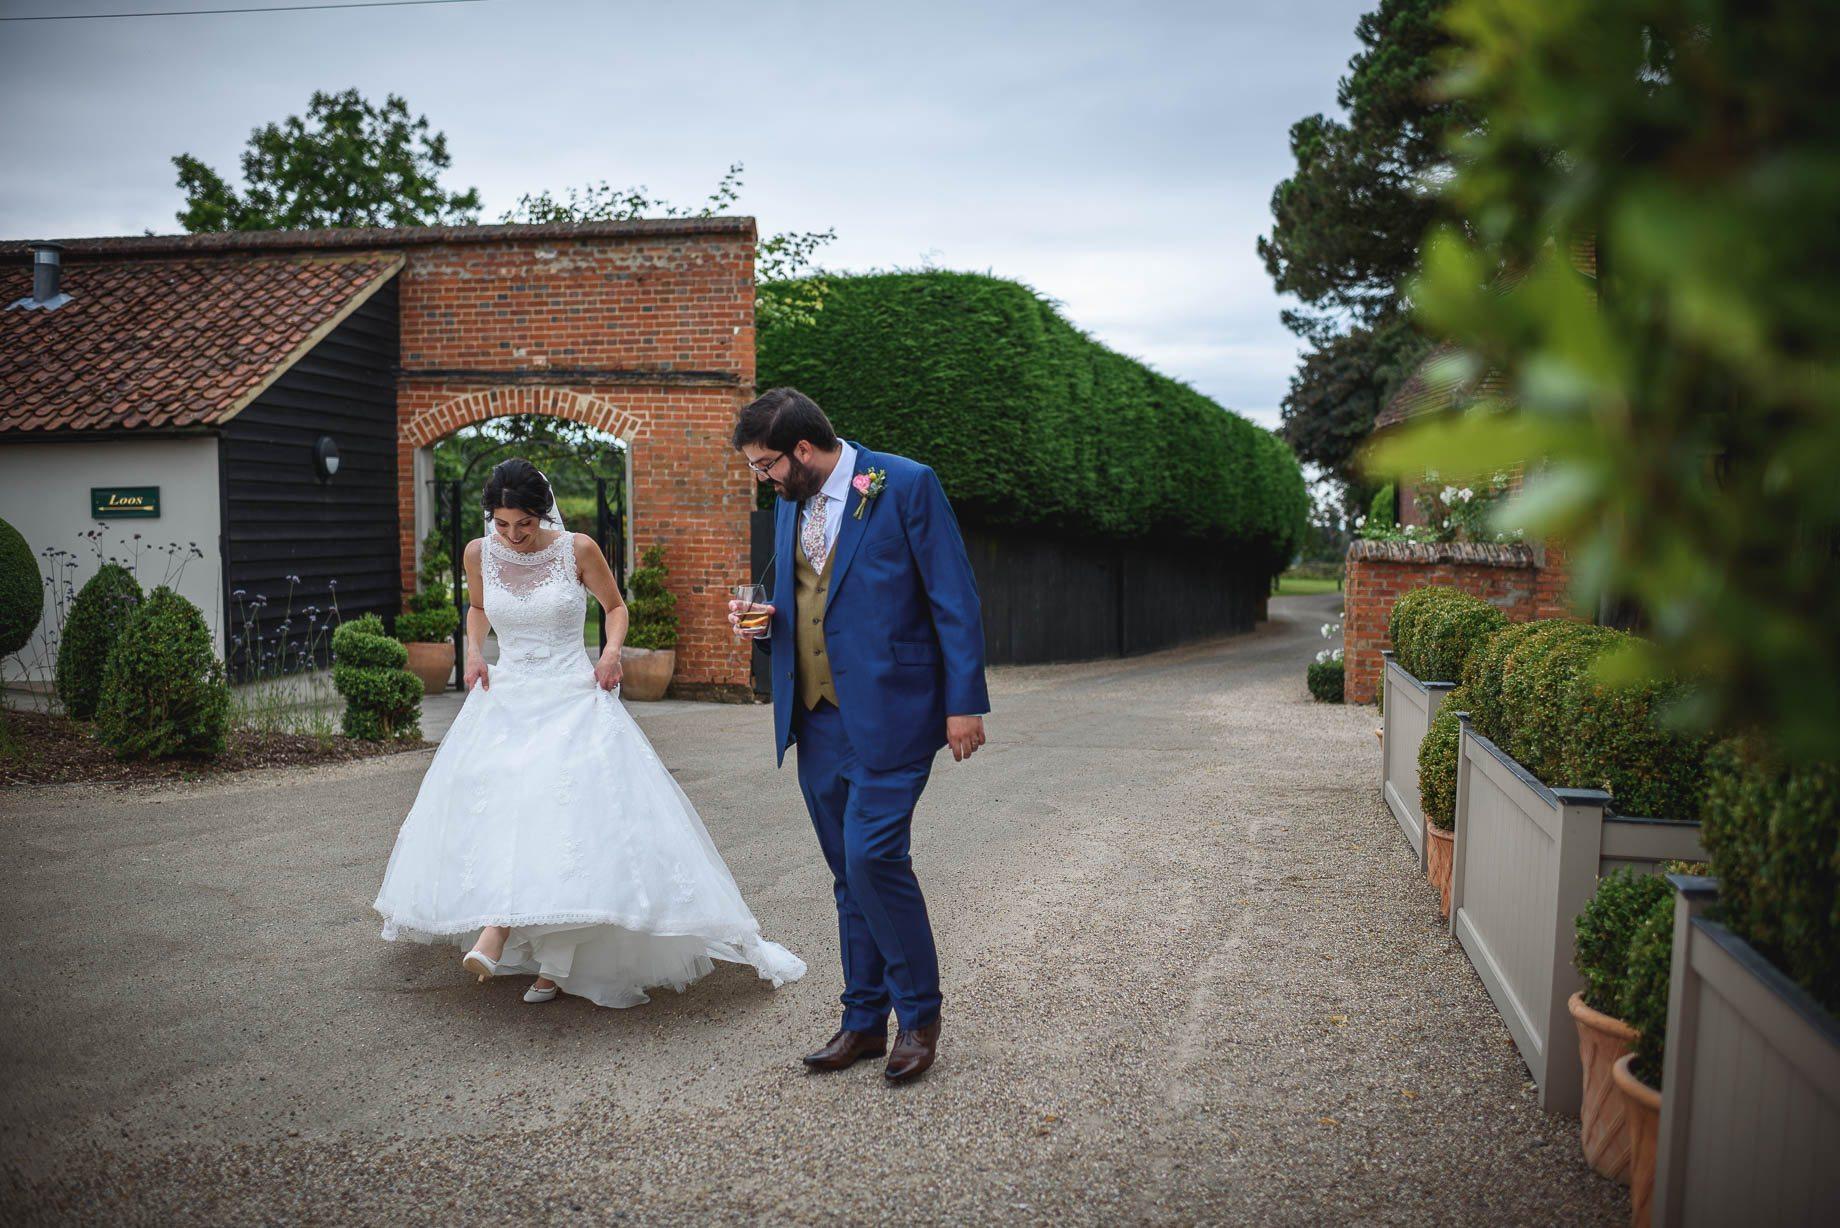 Gaynes Park wedding photography - Guy Collier Photography - Rachel and Jon (108 of 169)